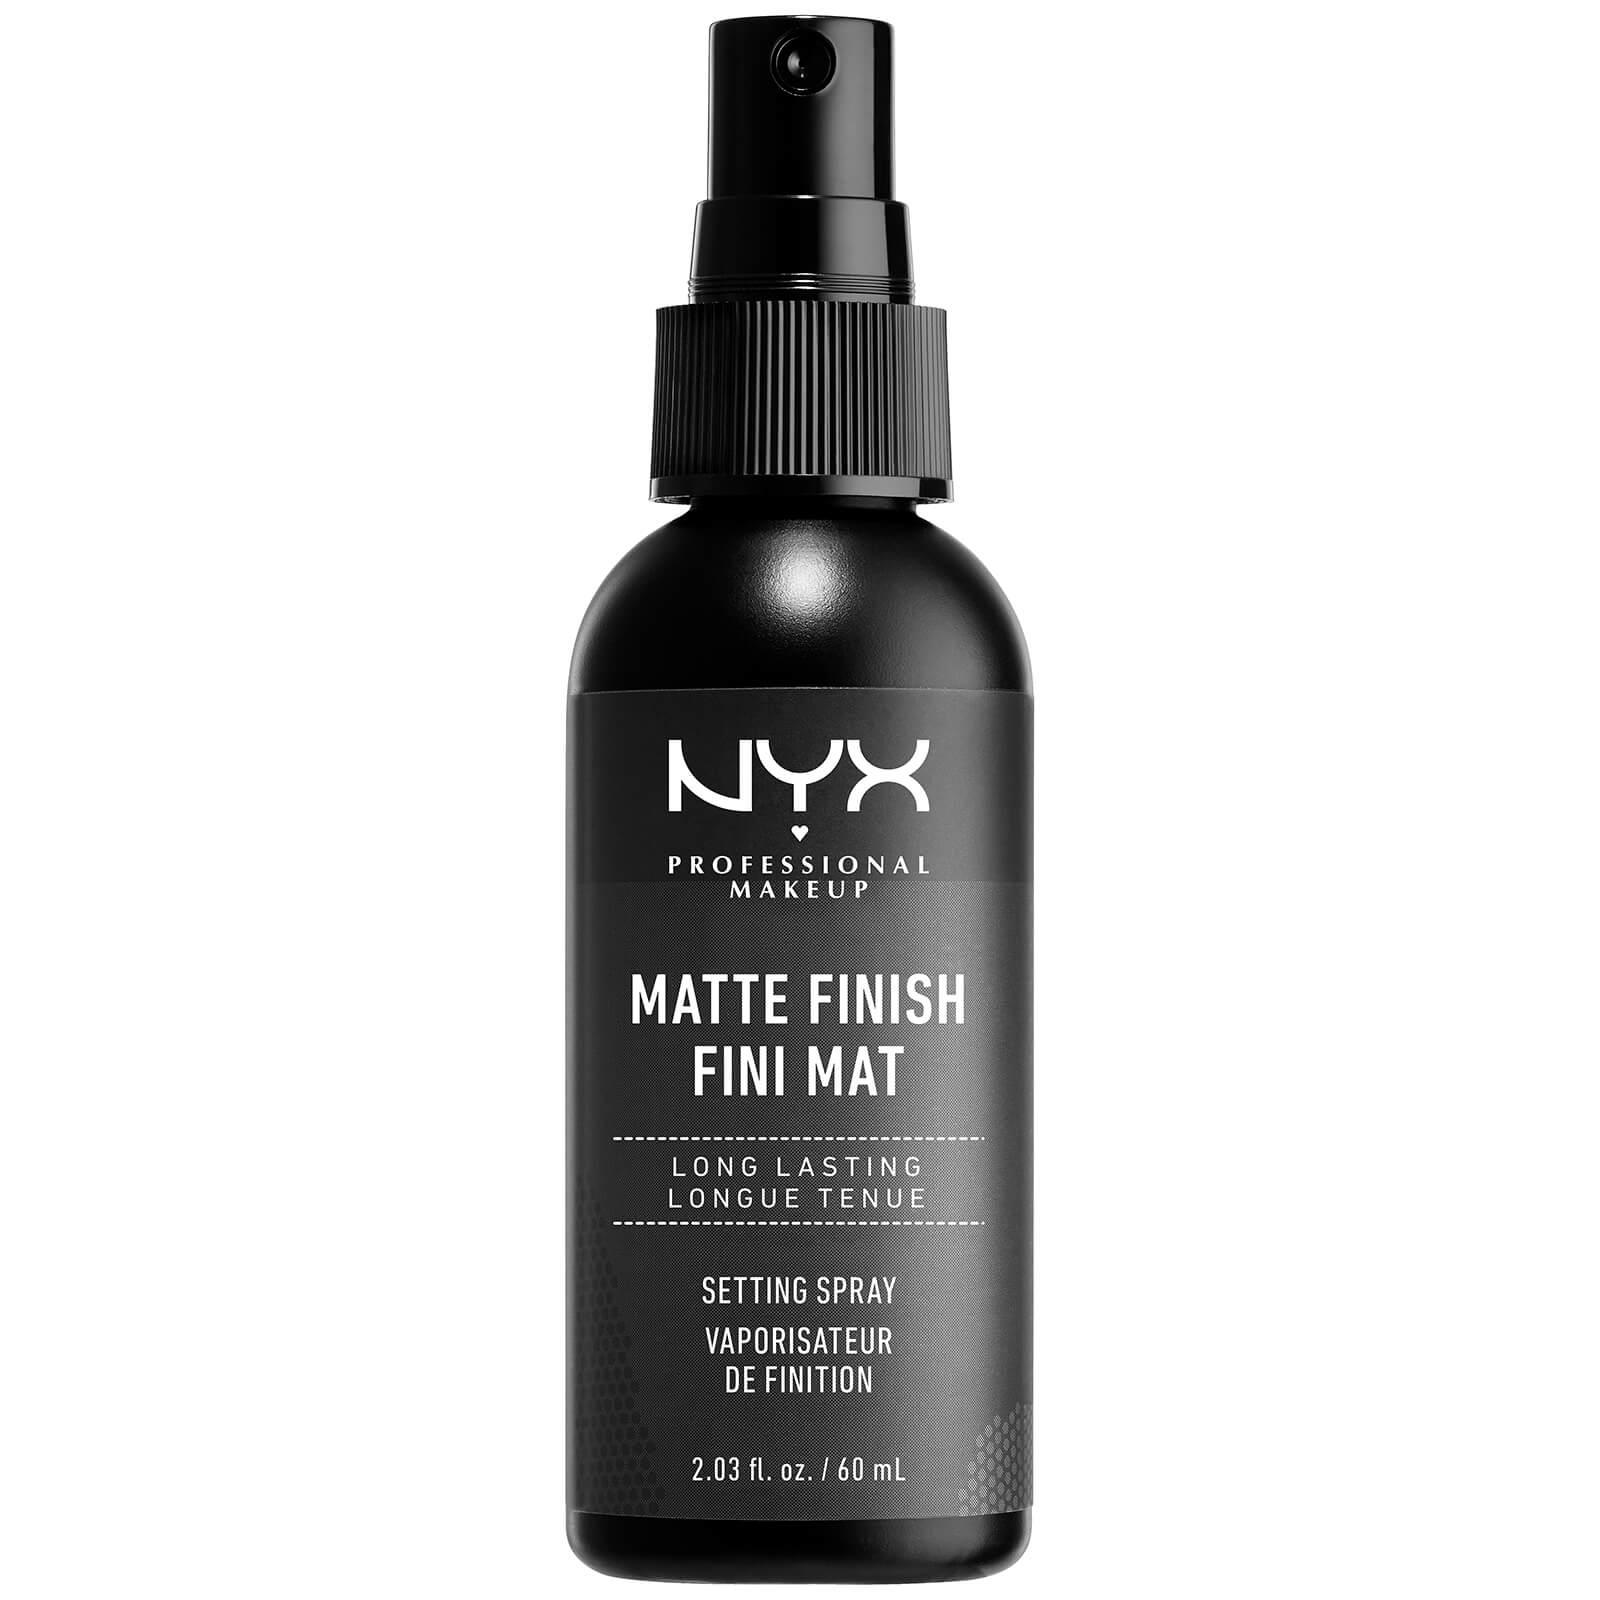 NYX Professional Makeup Make Up Setting Spray - Matte Finish/Long Lasting